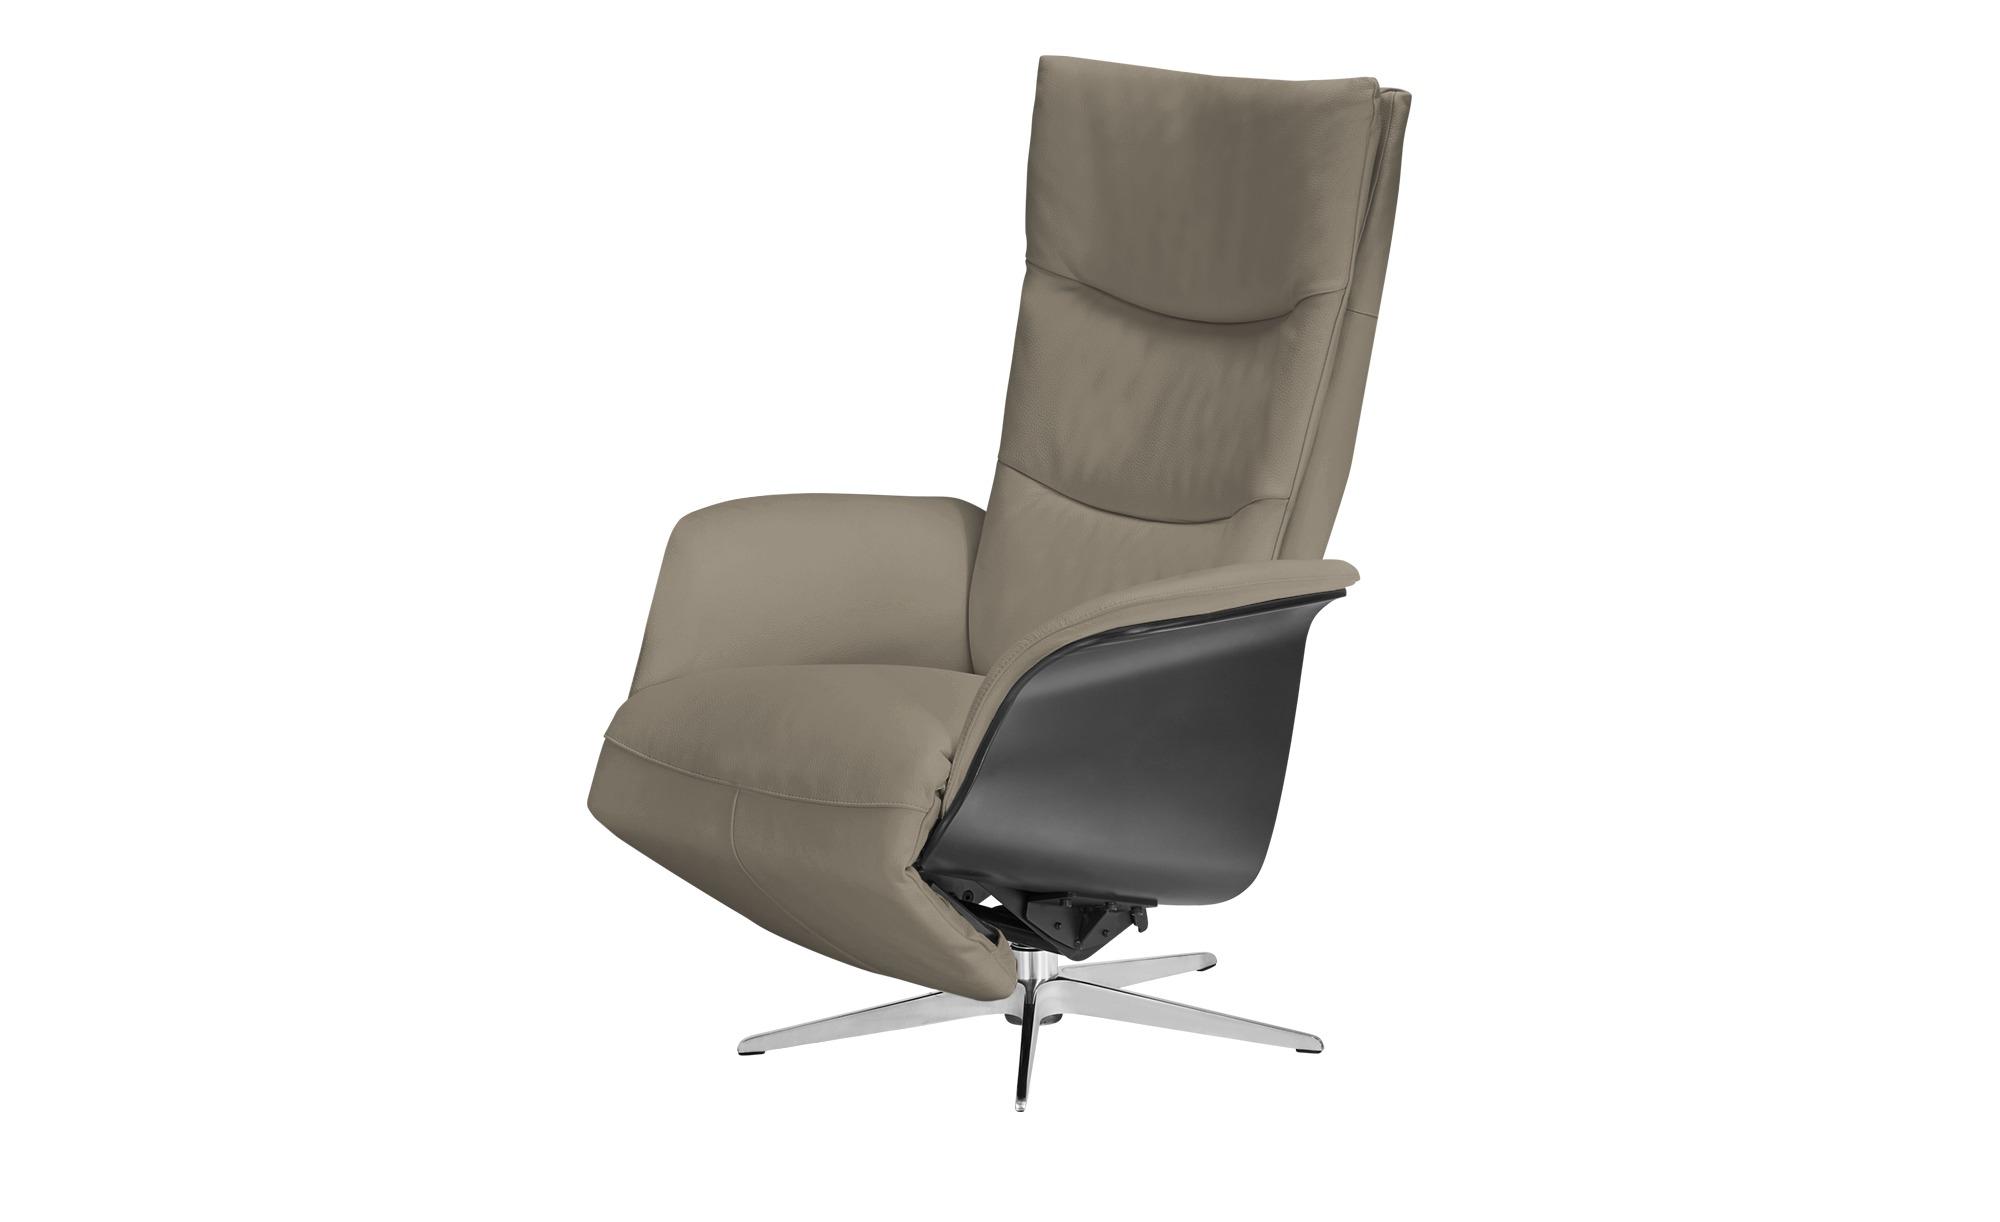 Nils Olsen Relaxsessel grau - Leder Mika ¦ grau ¦ Maße (cm): B: 77 H: 109 T: 82 Polstermöbel > Sessel > Fernsehsessel - Höffner